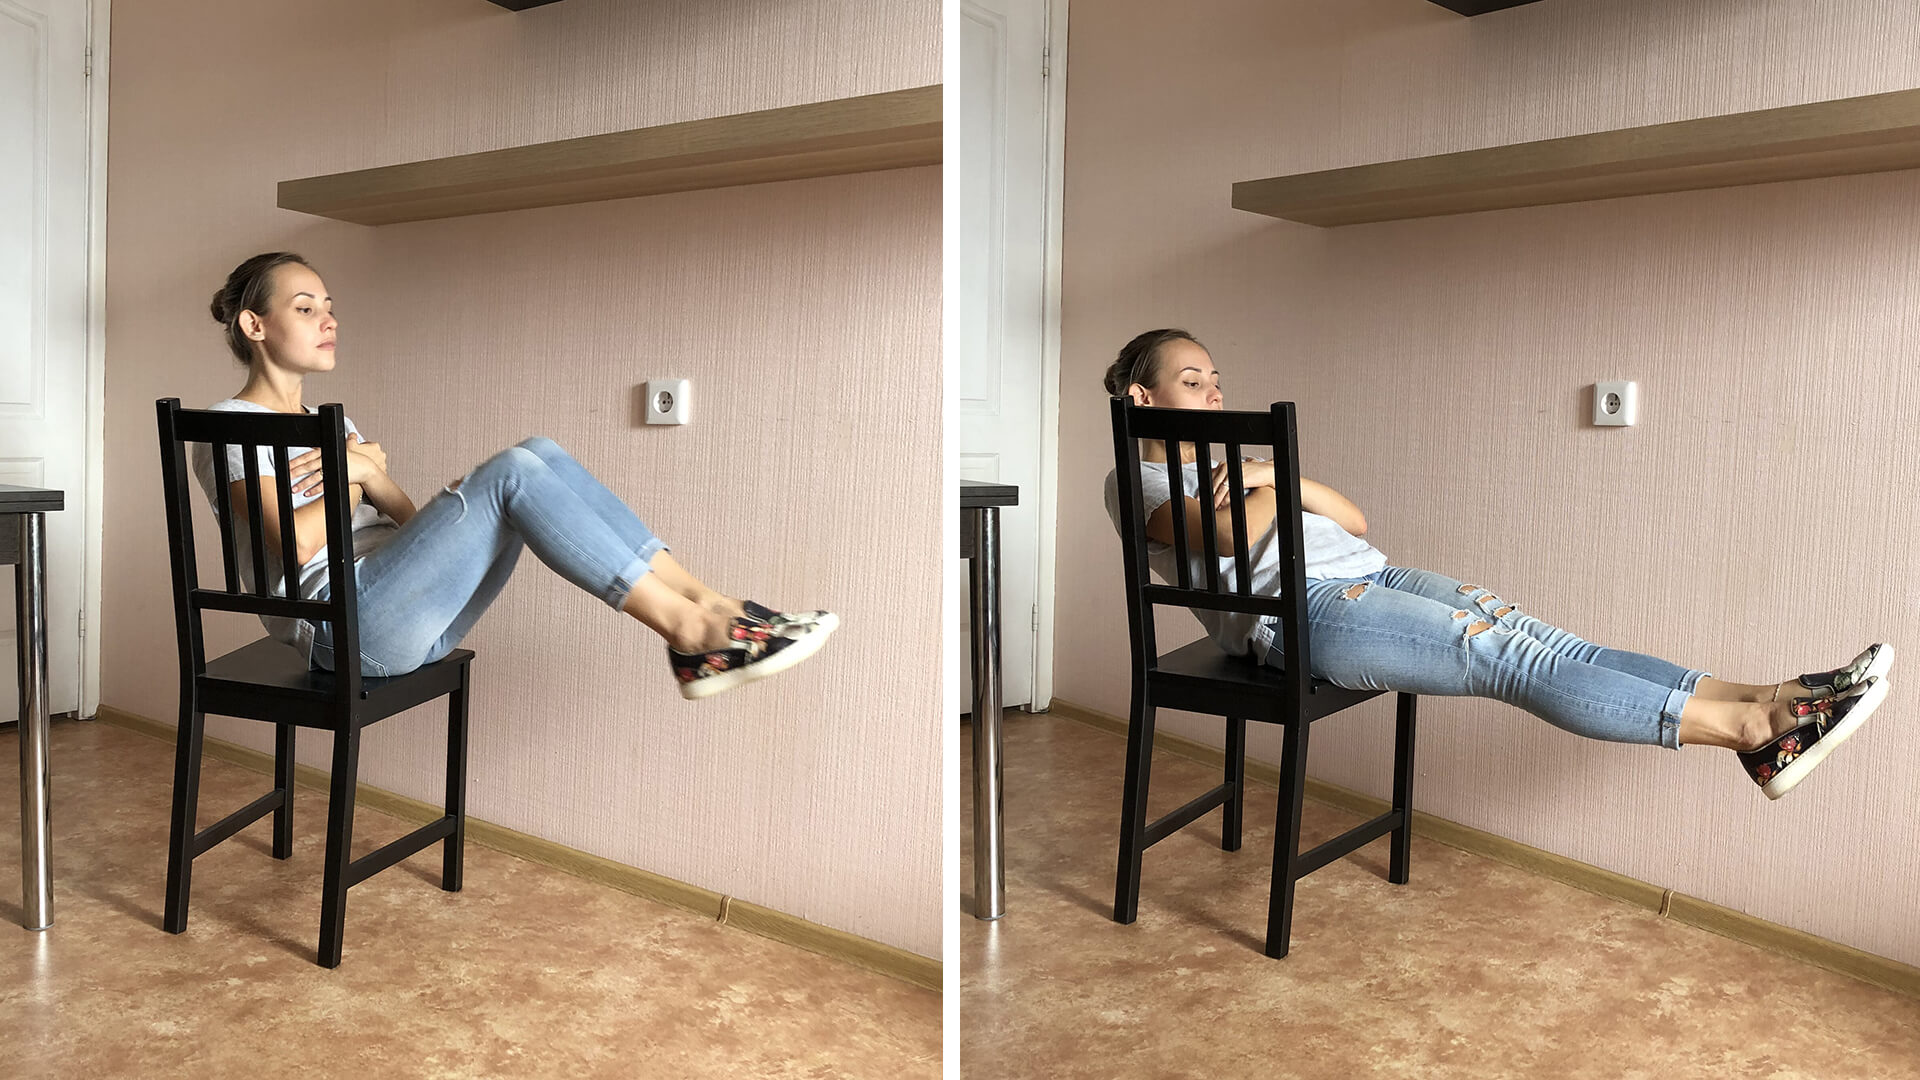 Склада на стуле.